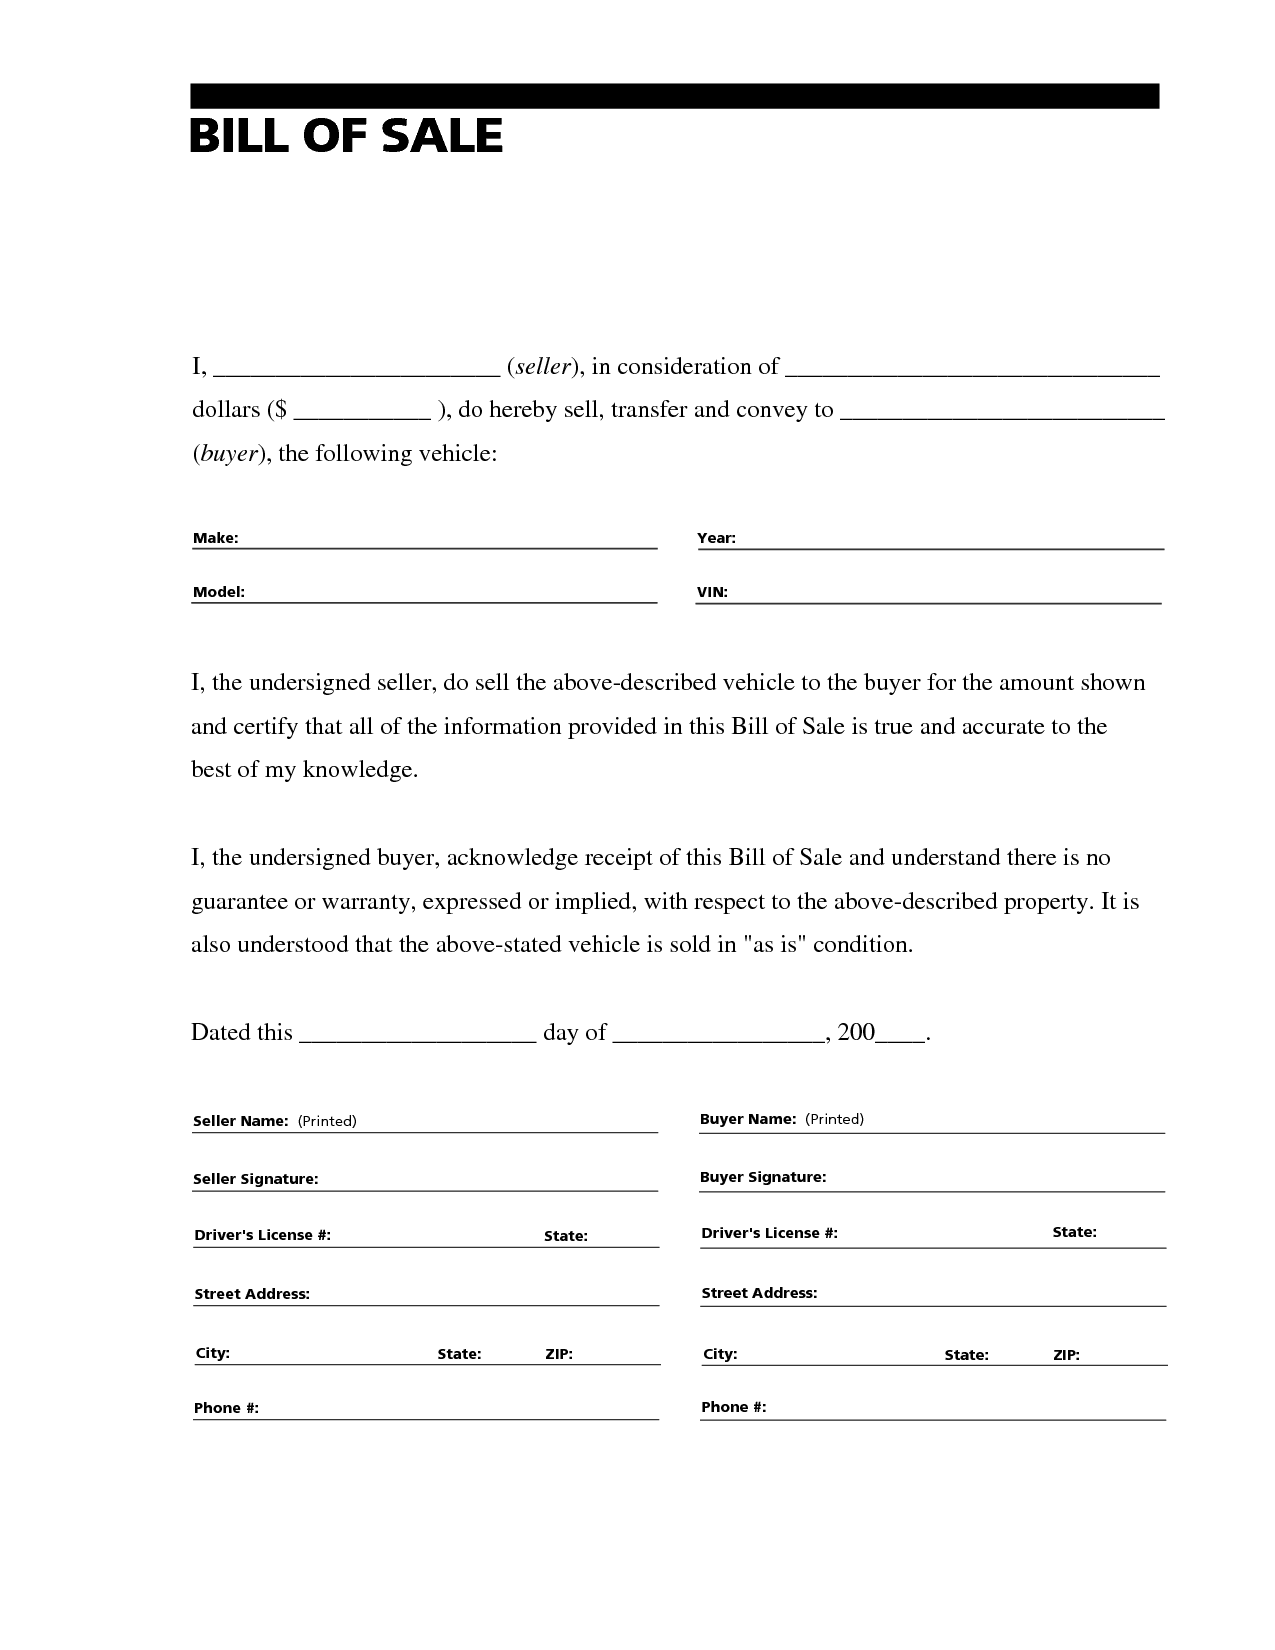 generic bill of sale form